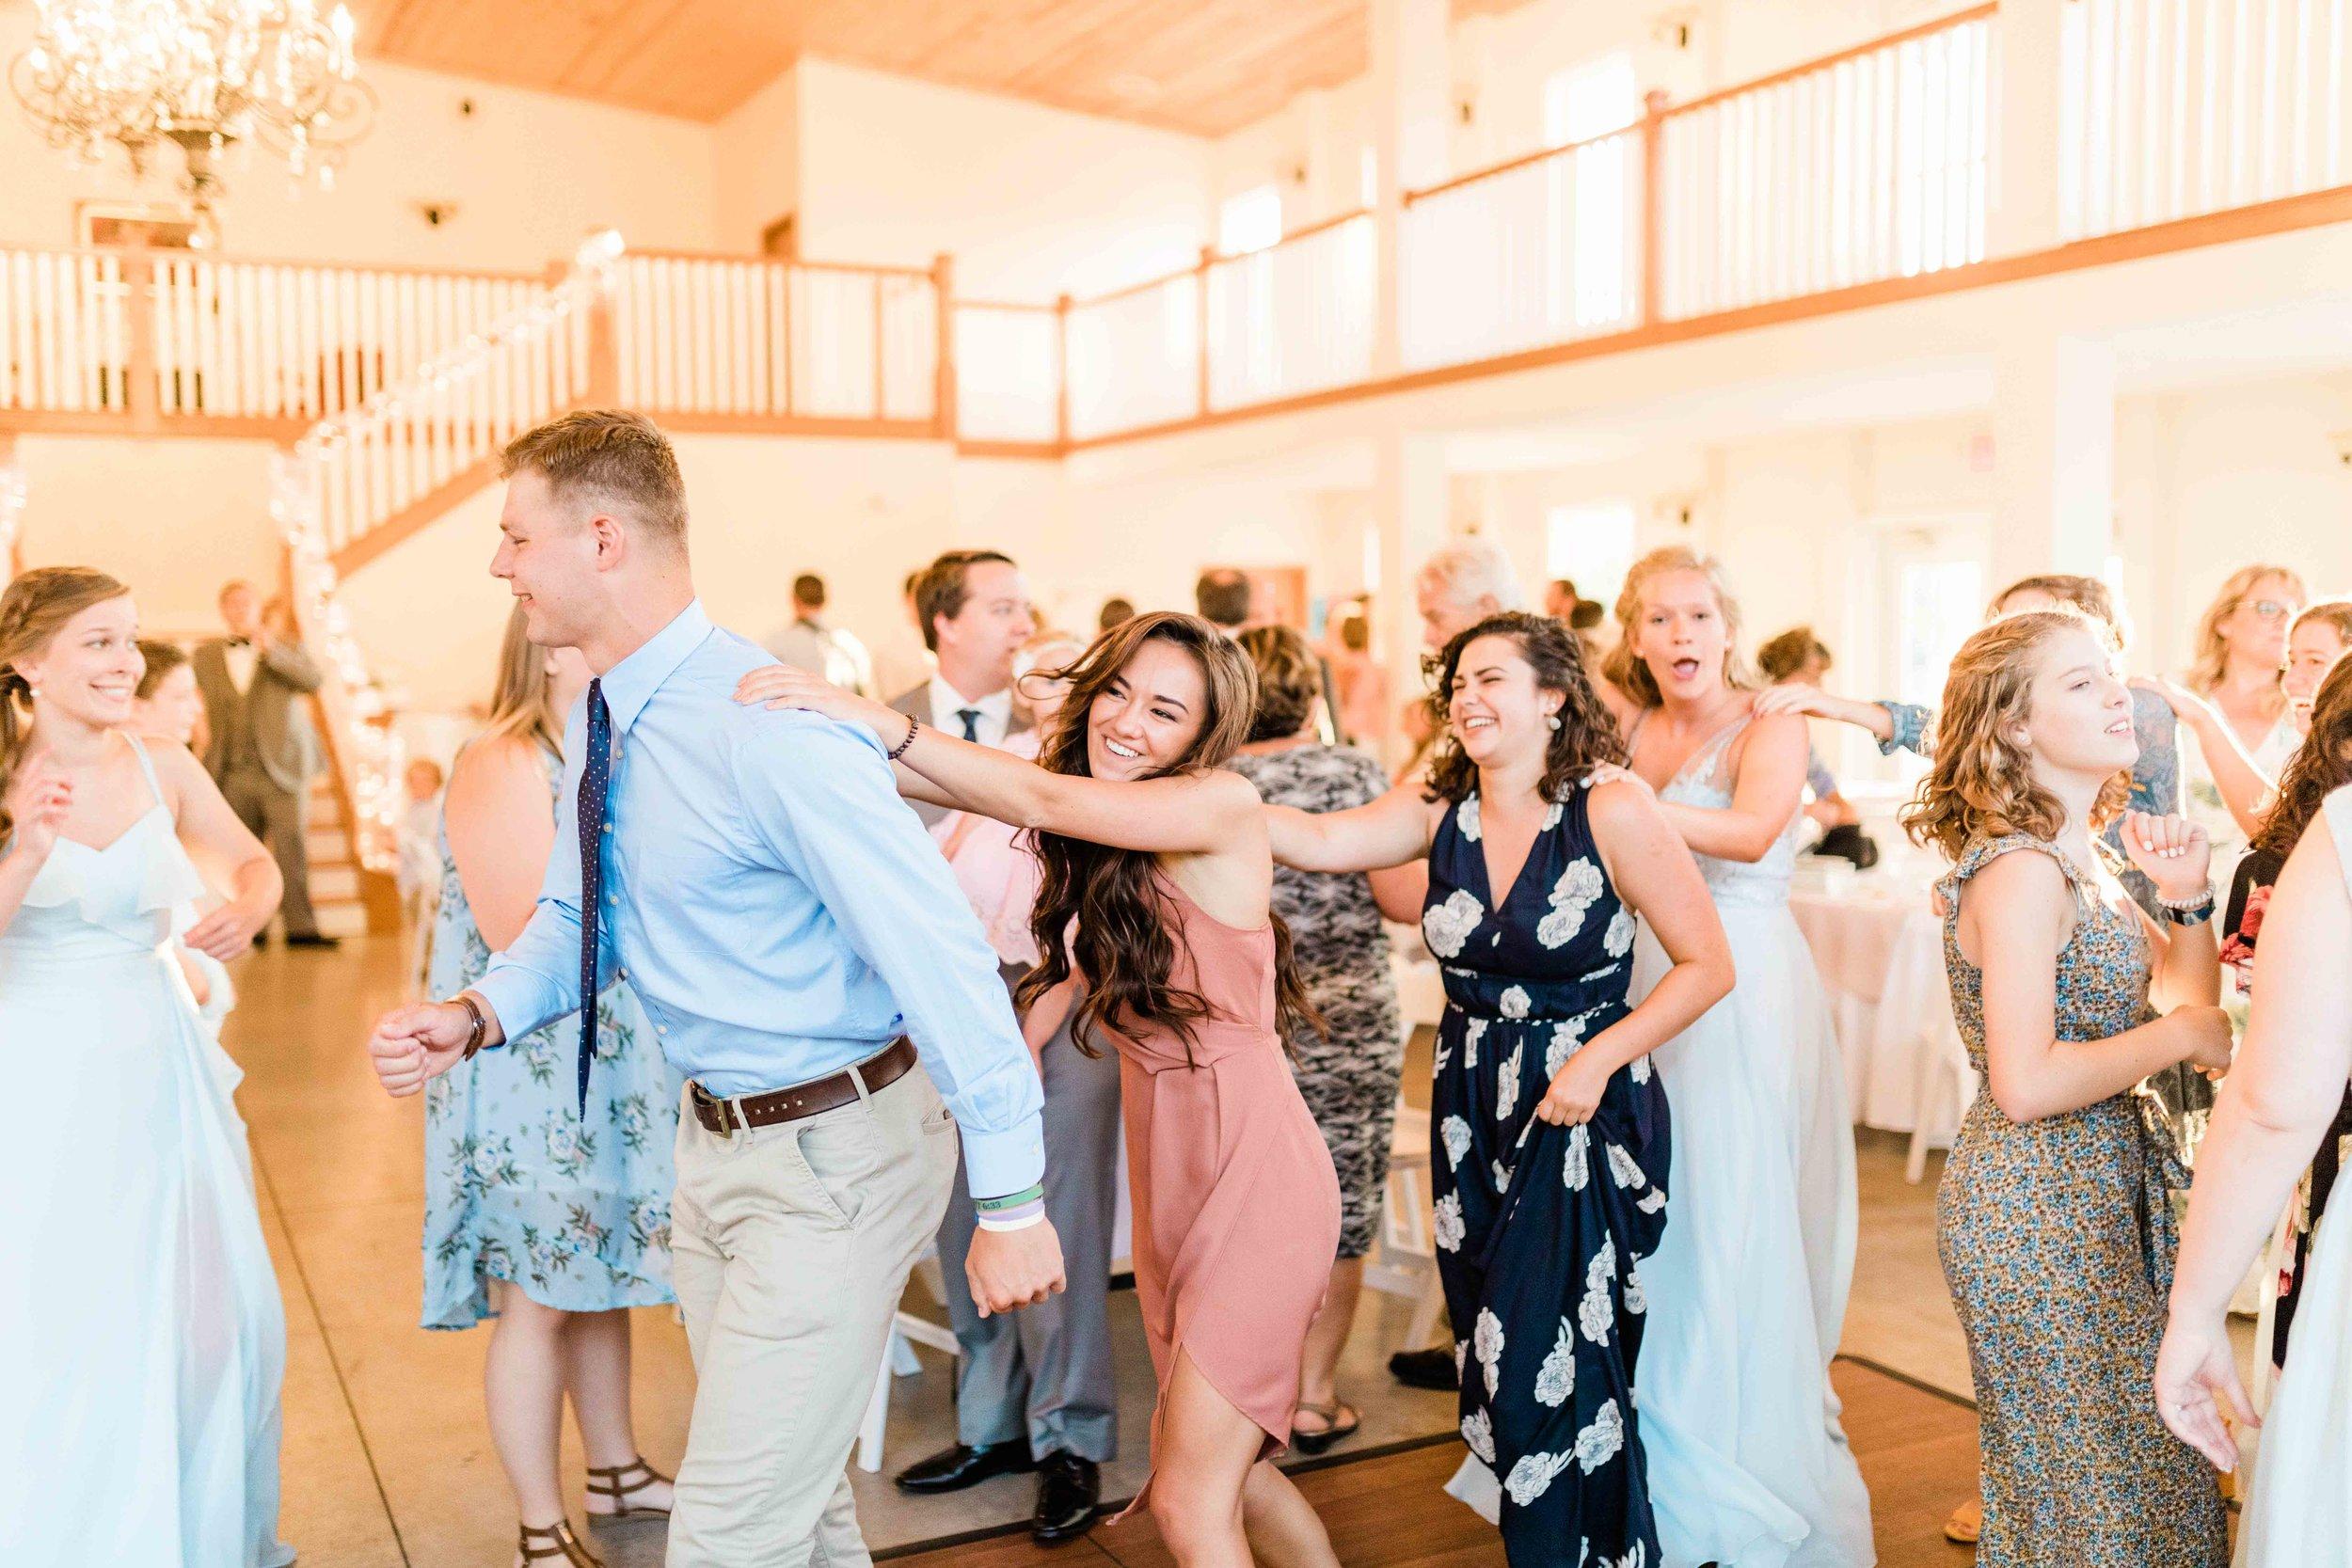 rosewood manor miamisburg wedding photos-13.jpg